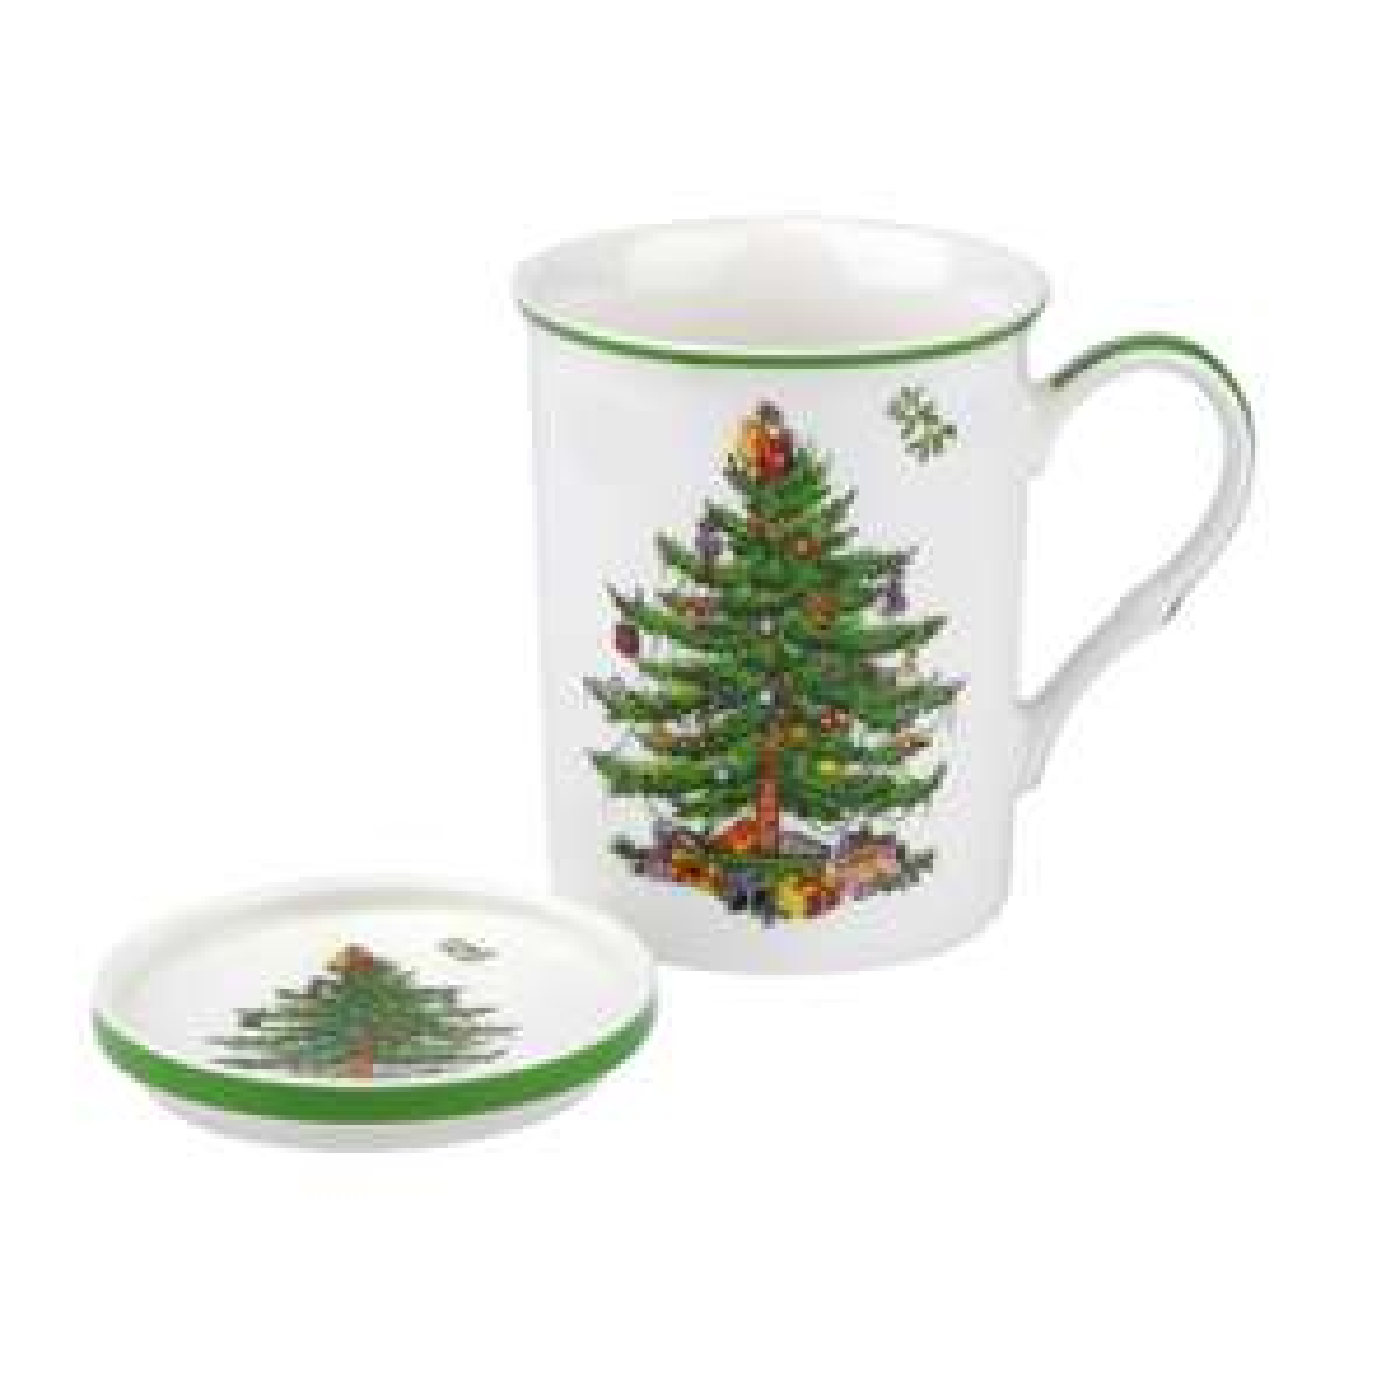 Spode Christmas Tree - Mug And Coaster Set - £4.49 / £7.44 Delivered @ ECookshop